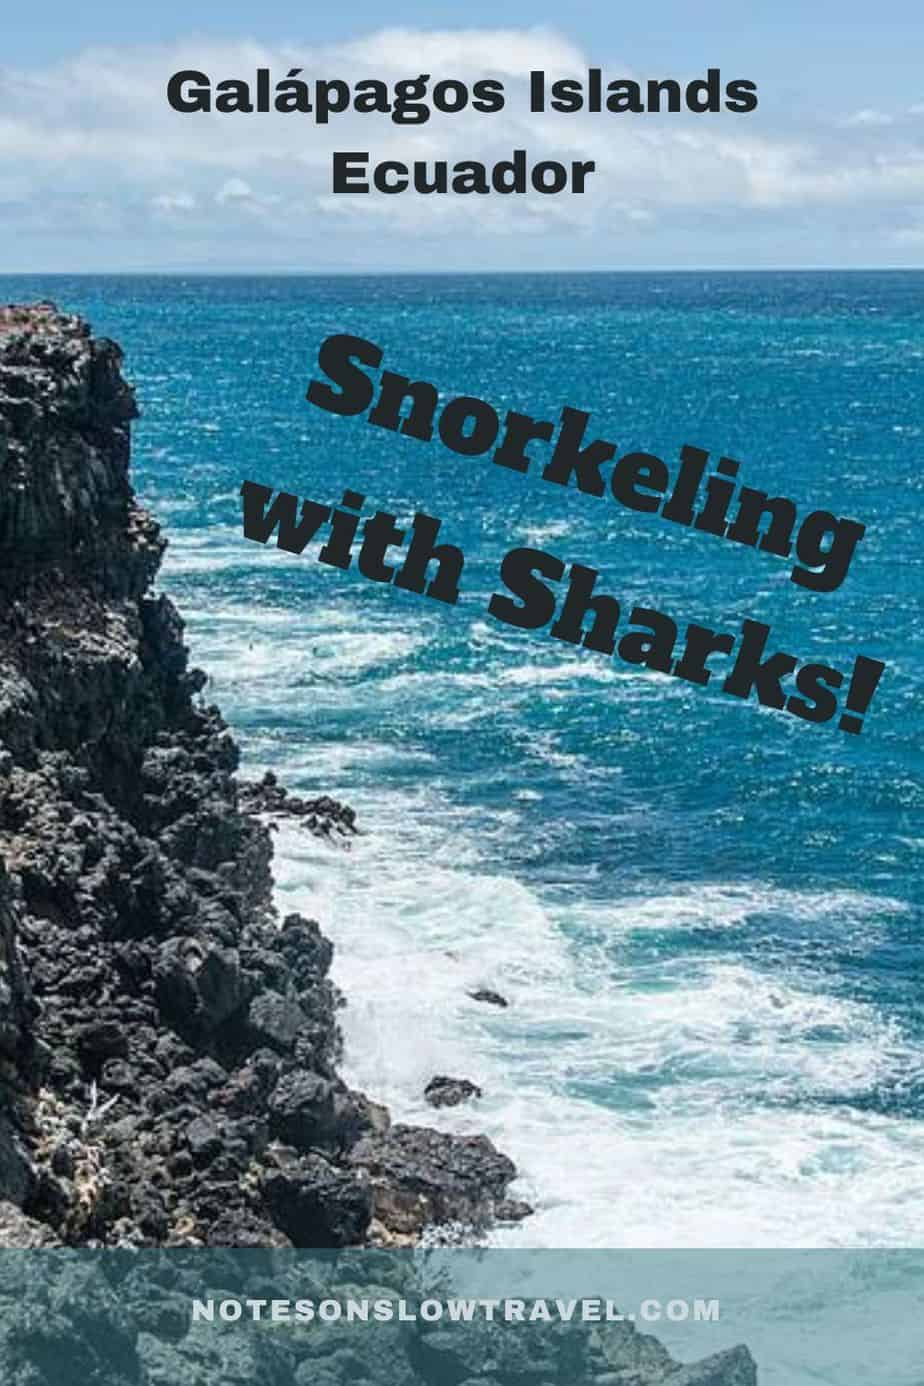 Snorkeling with sharks, Ecuador